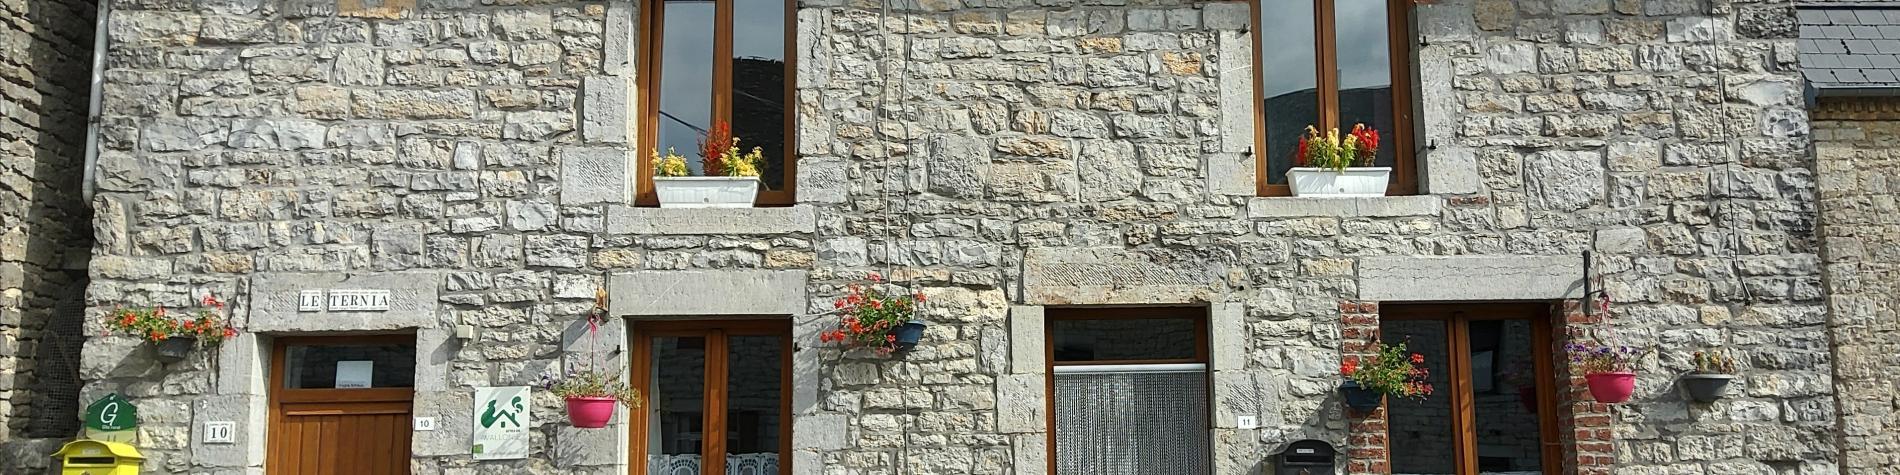 Gîte rural Le Ternia - Mazée - Vue de la façade